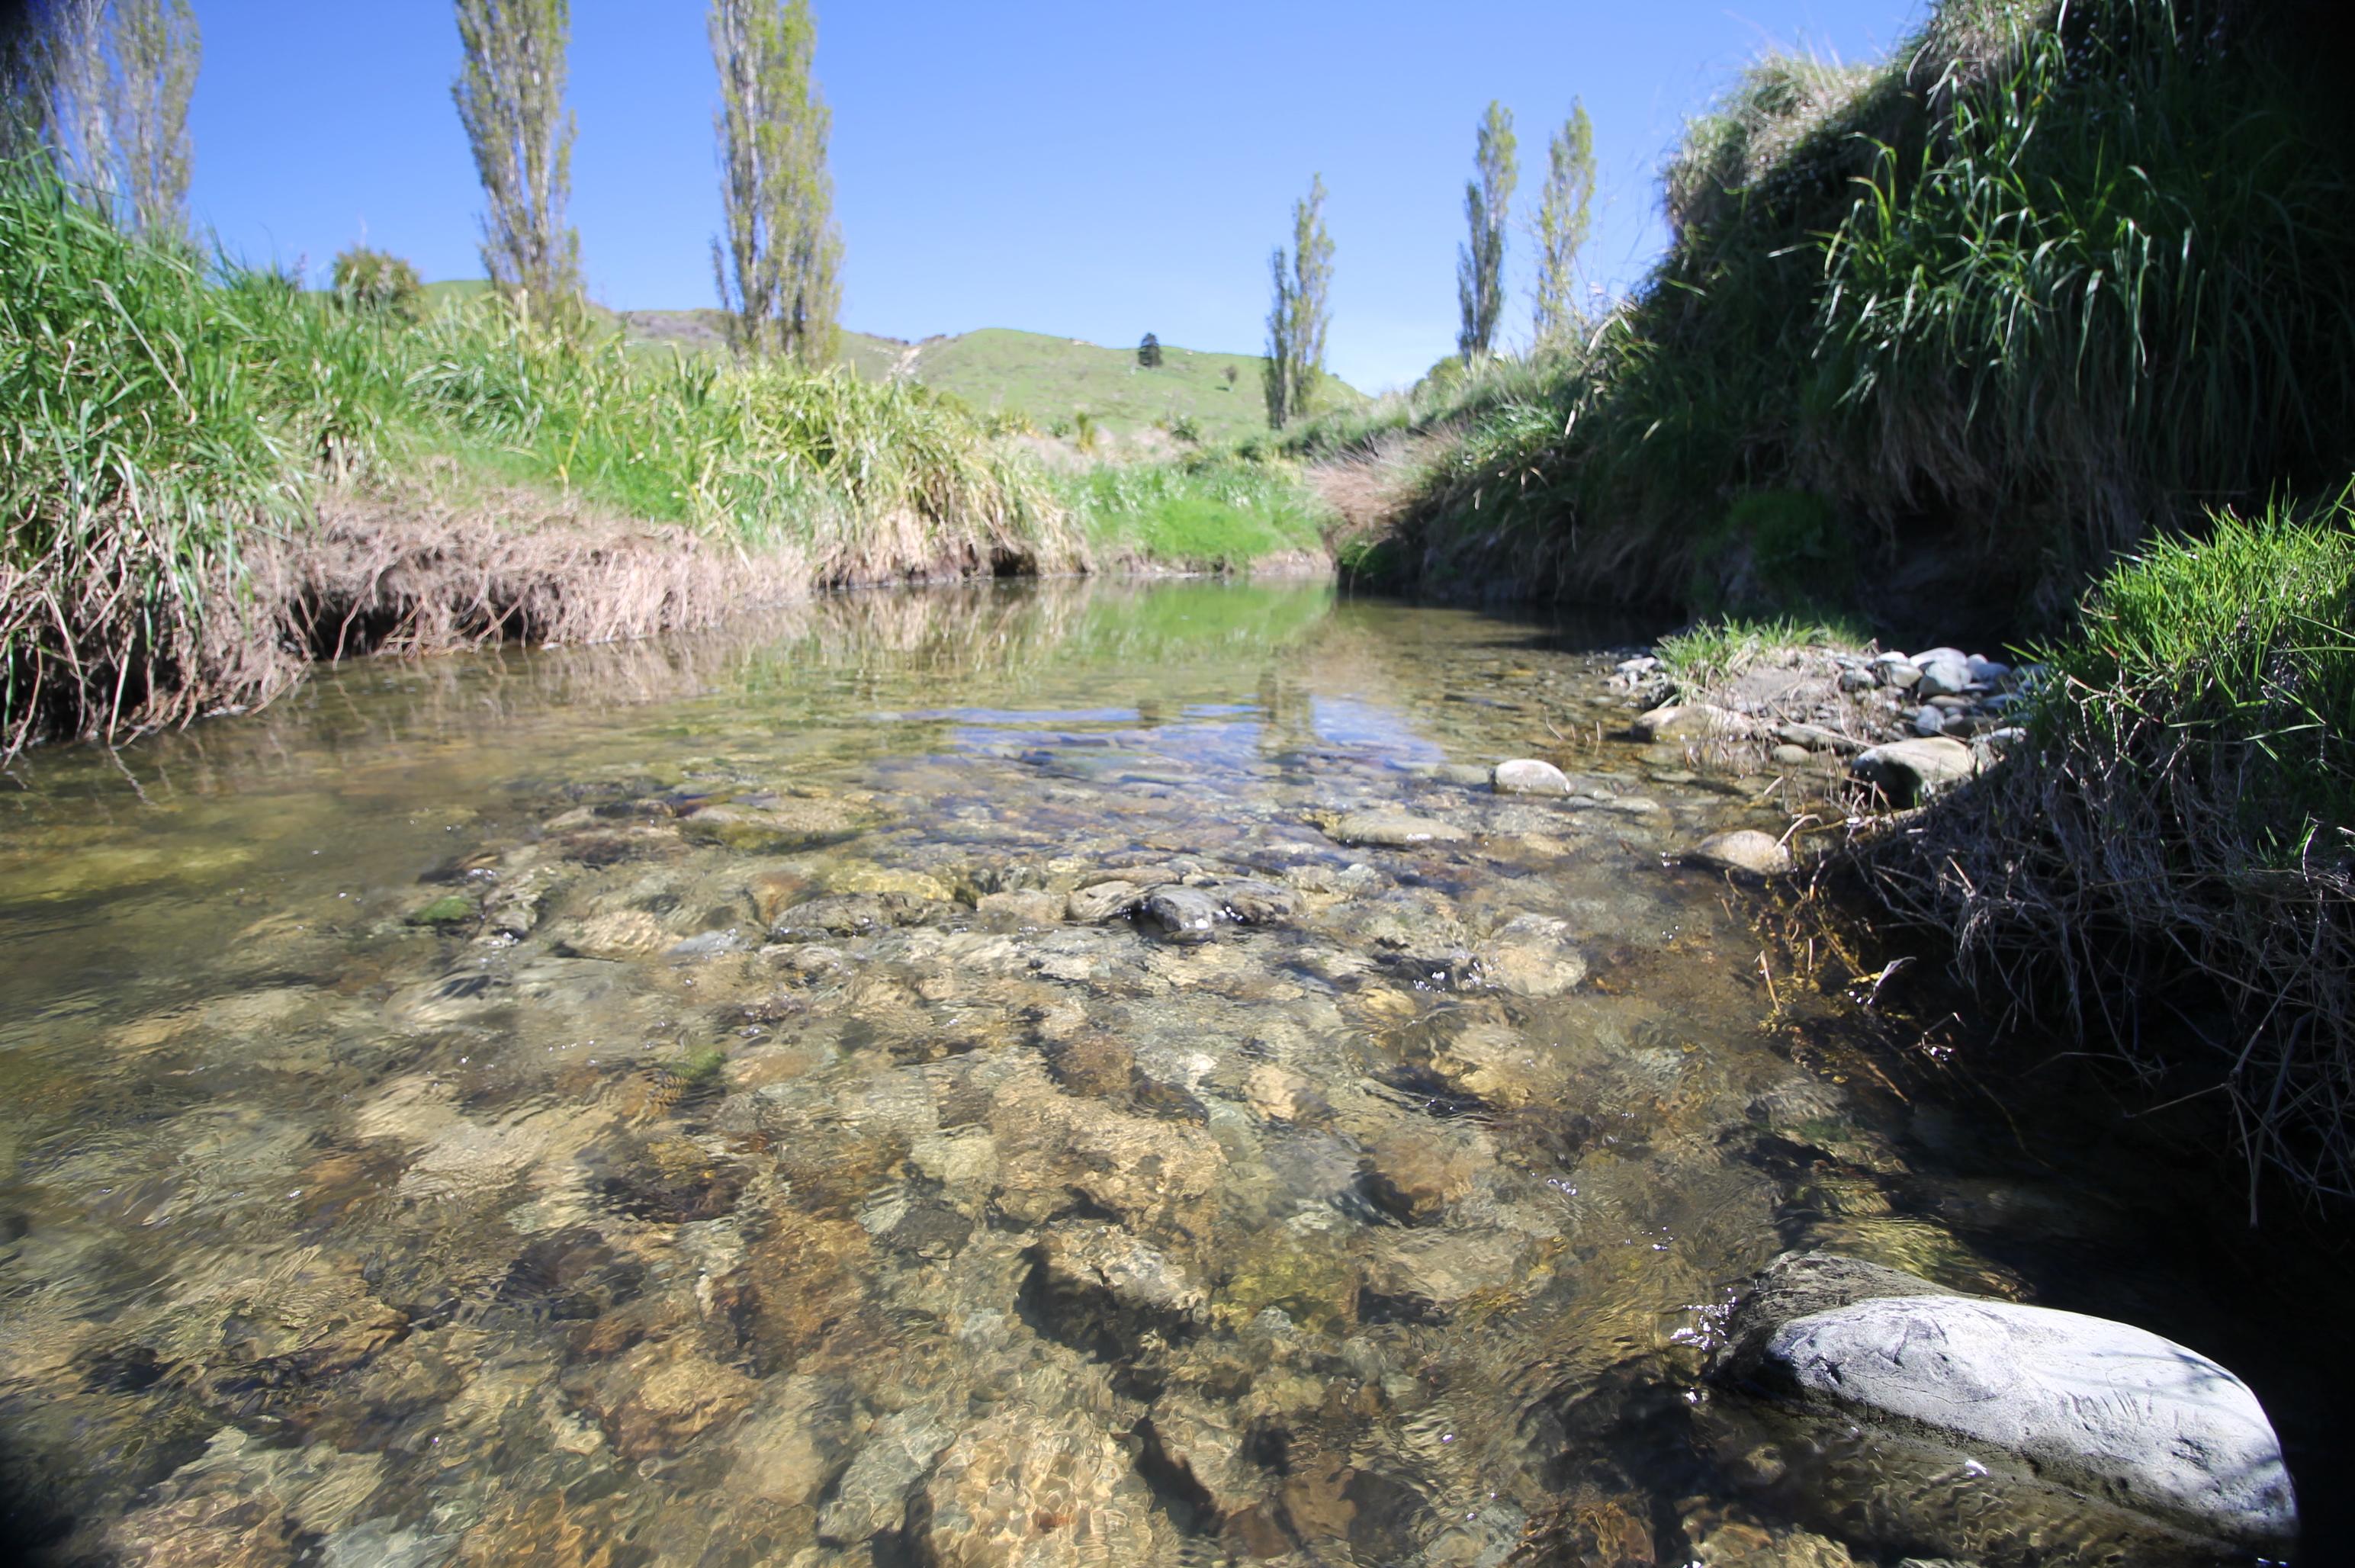 Australasia Riverprize – 2018